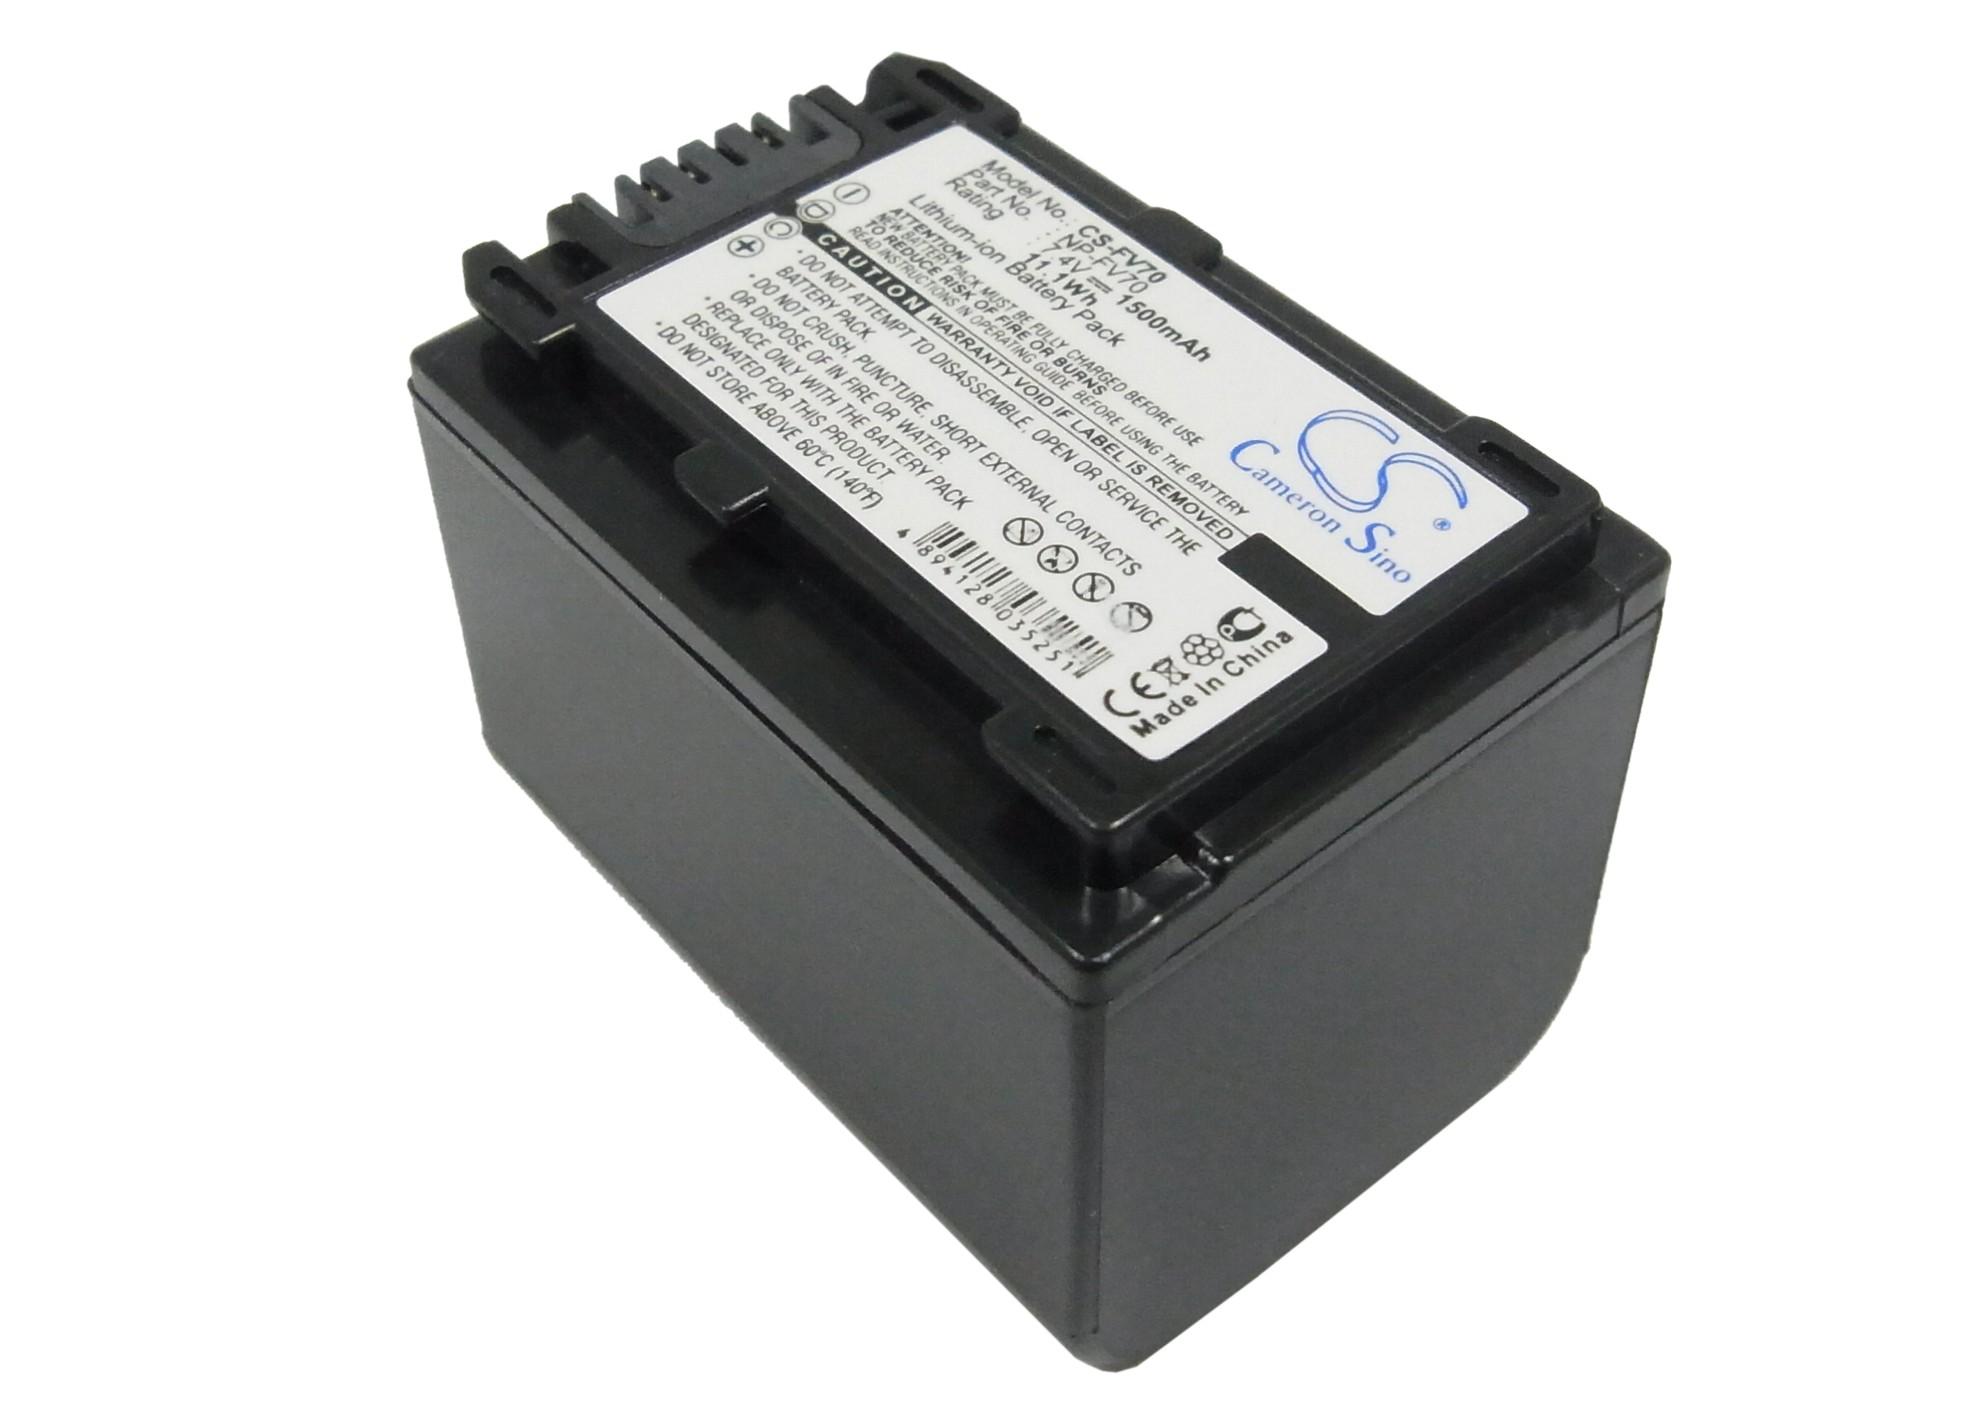 Cameron Sino baterie do kamer a fotoaparátů pro SONY DCR-DVD404E 7.4V Li-ion 1500mAh černá - neoriginální